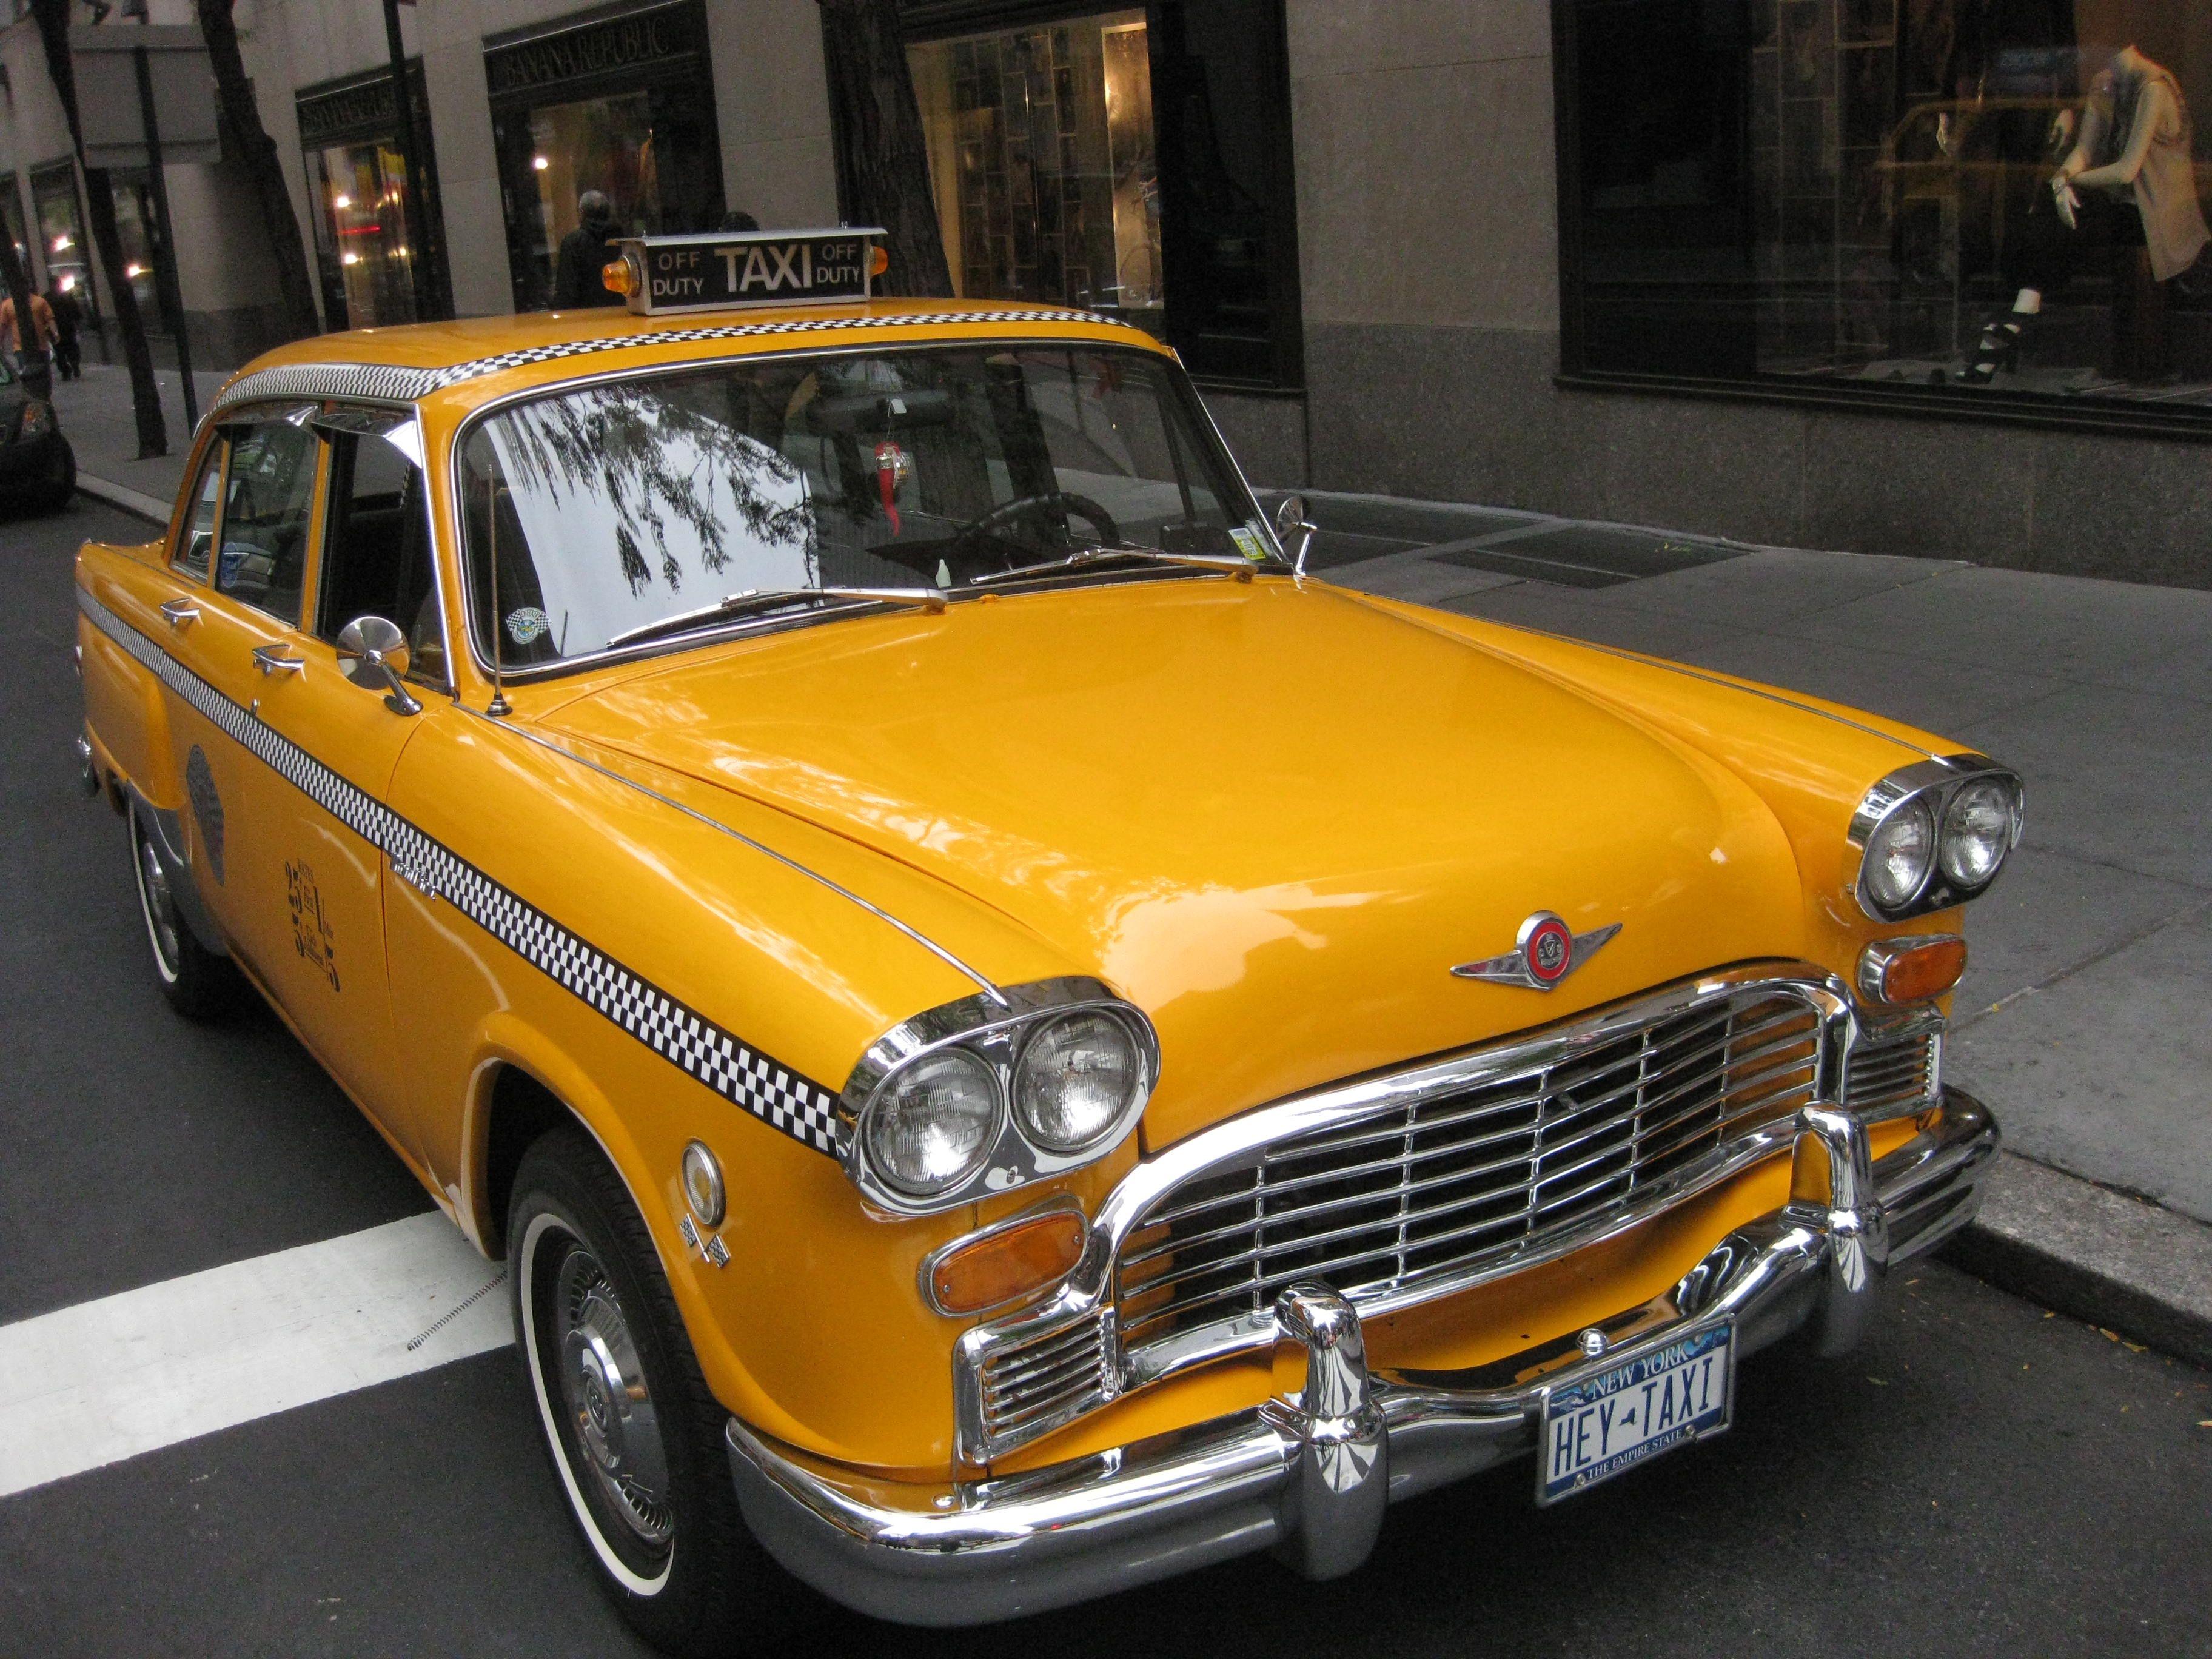 yellow taxi portugal - Google - https://www.youtube.com/watch?v=jdNjqN_7tXs